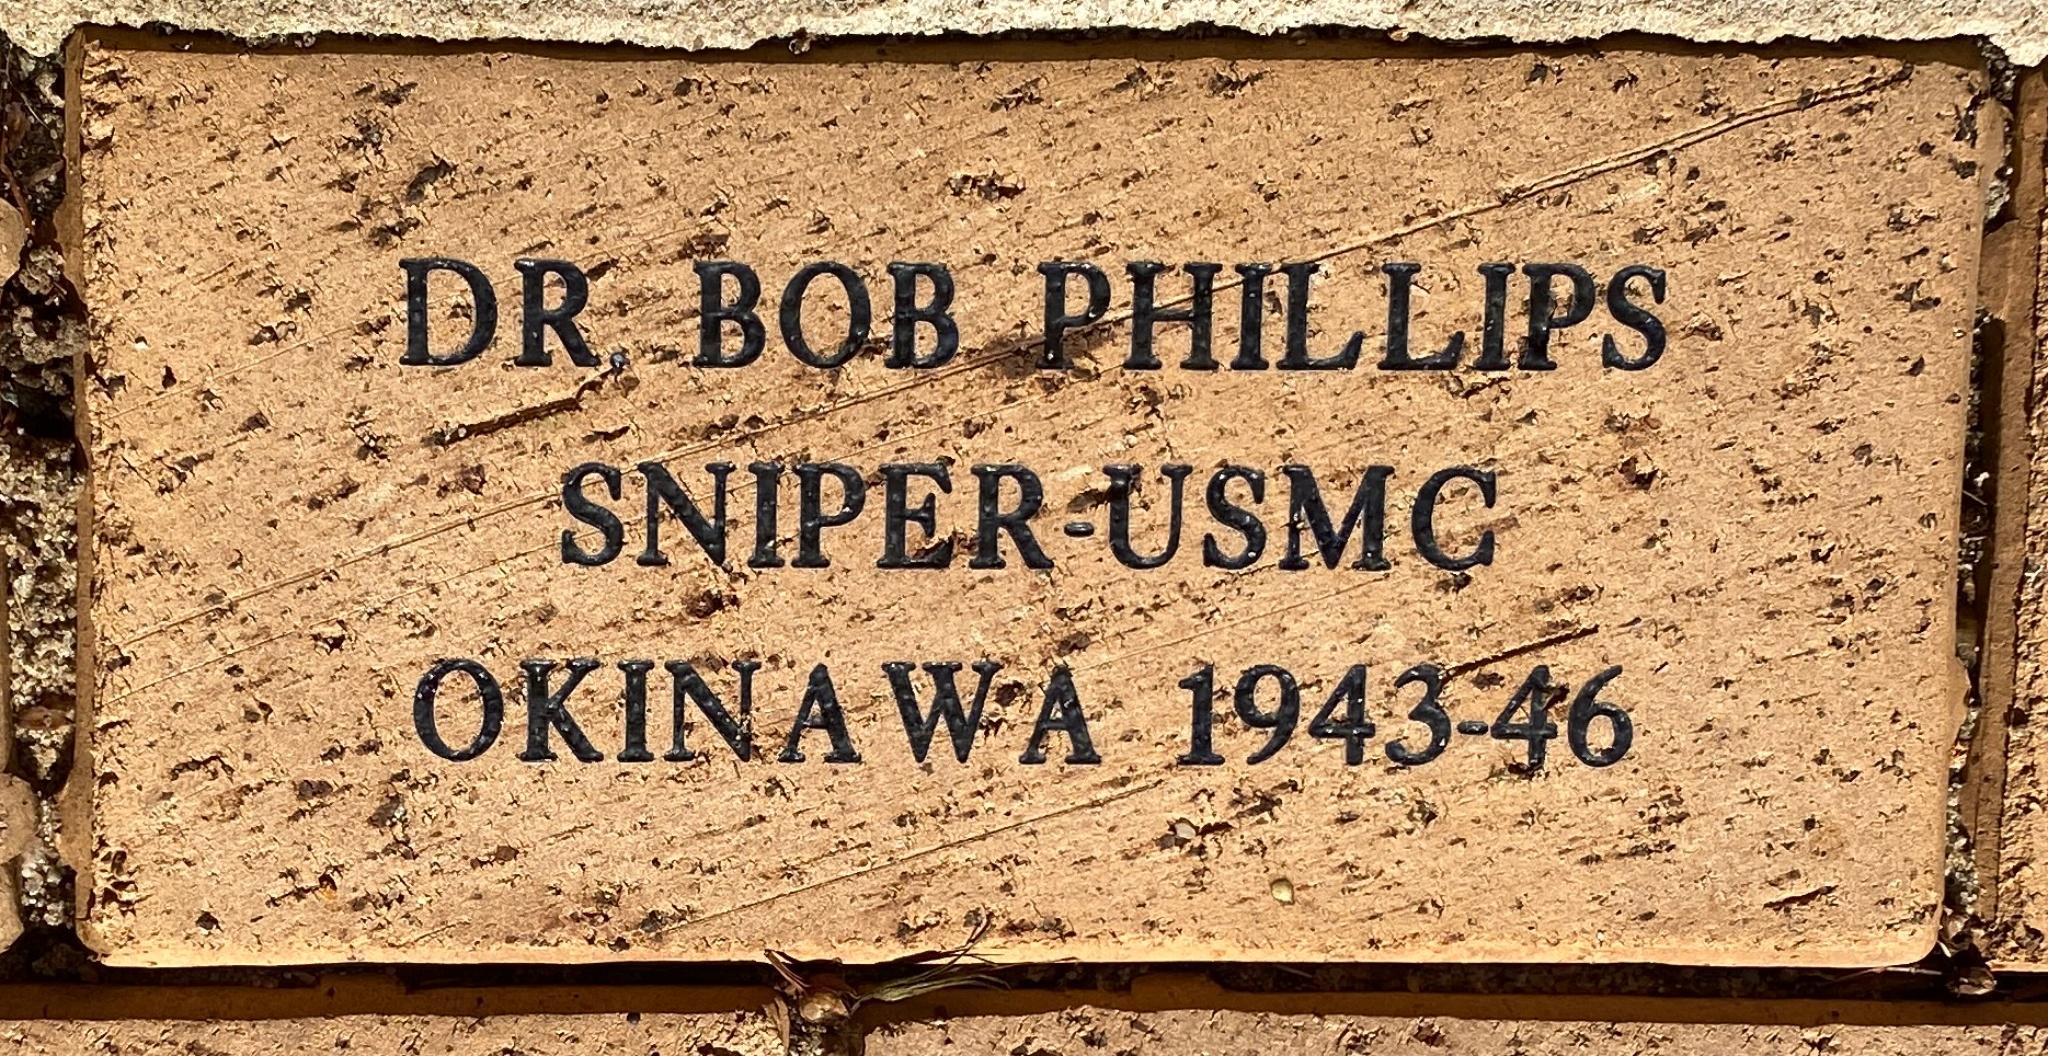 DR. BOB PHILLIPS SNIPER-USMC OKINAWA 1943-46